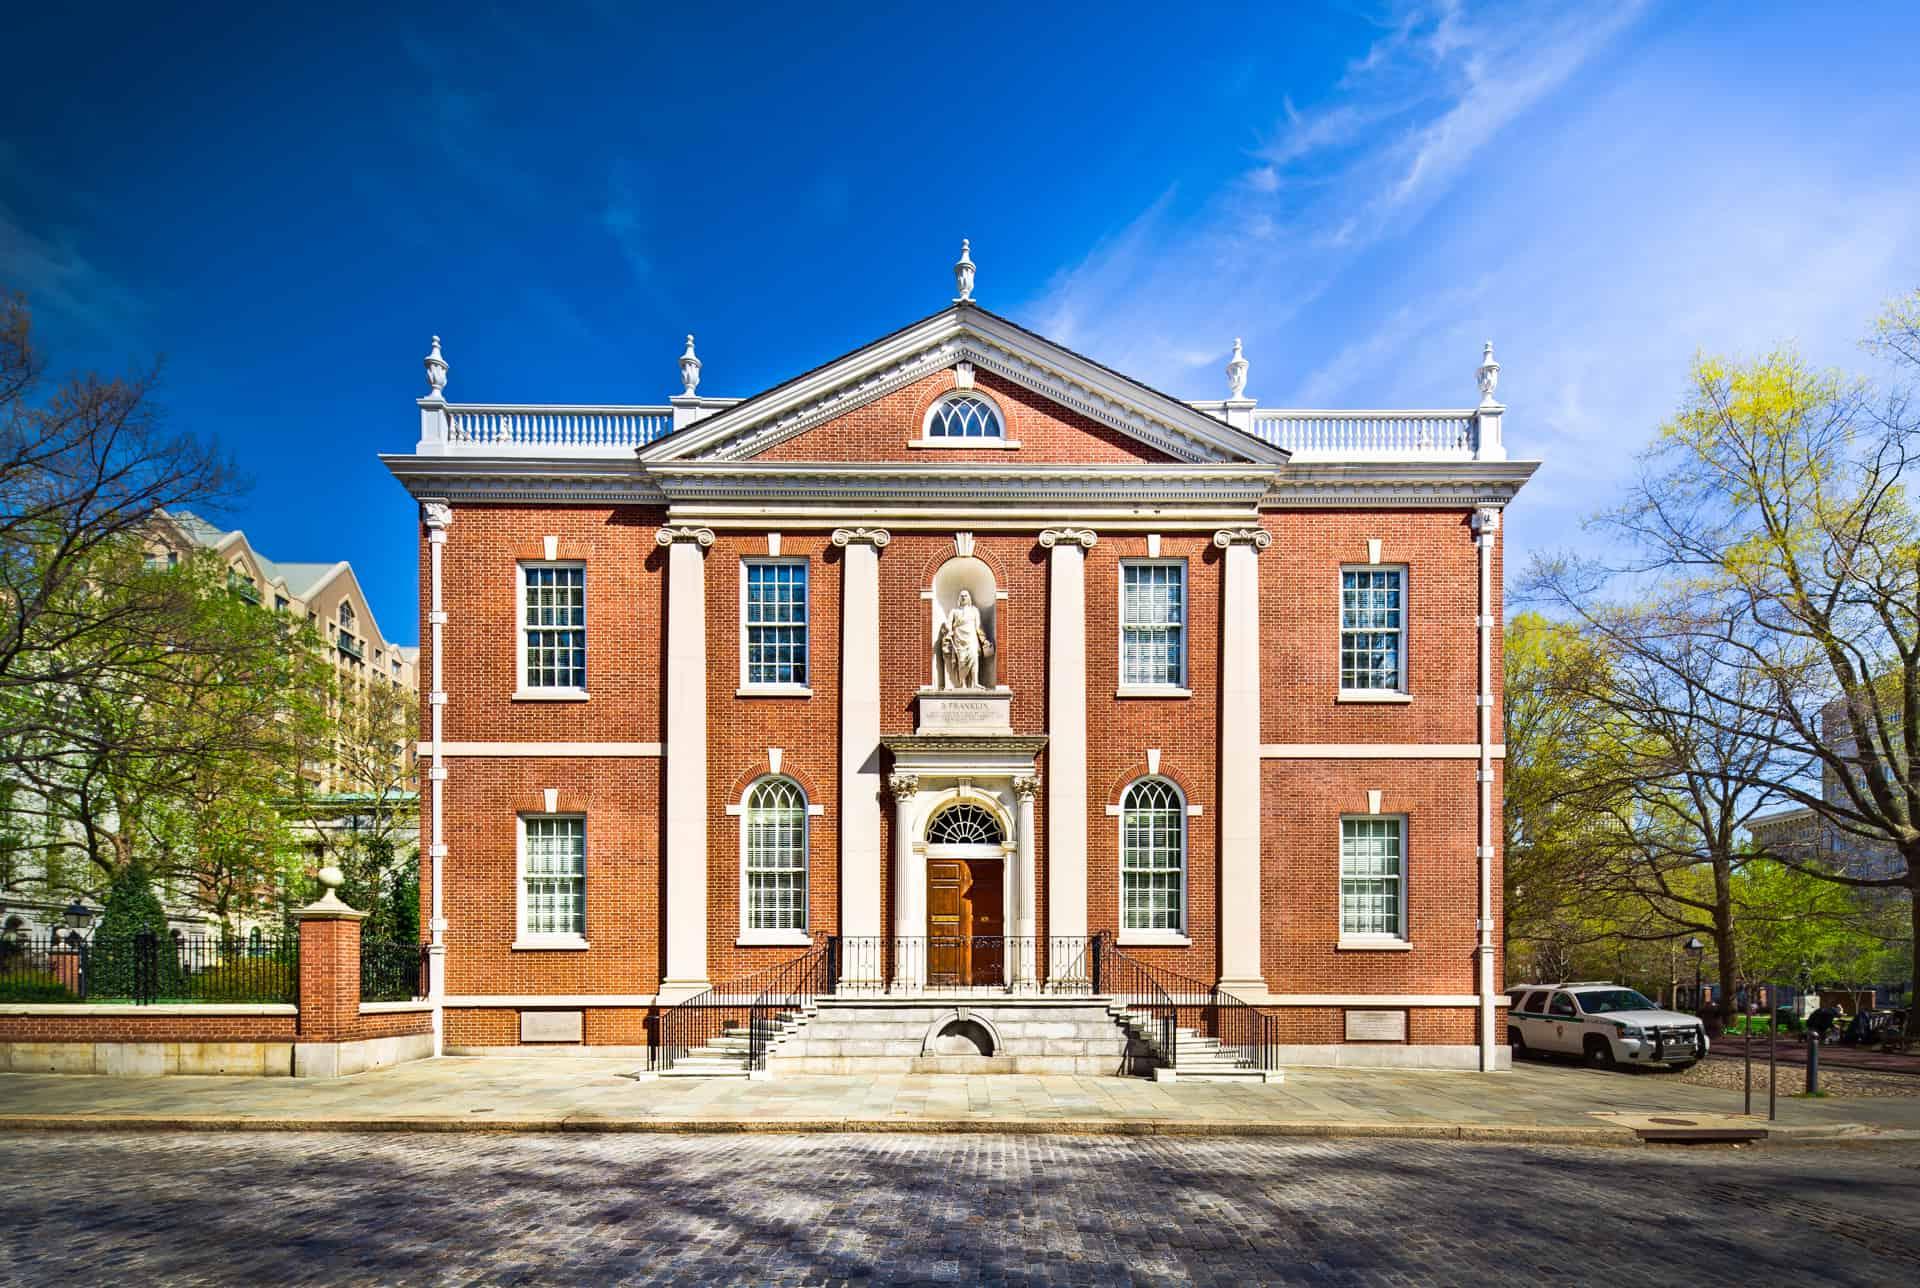 Photo of Philadelphia Landmark - The American Philosophical Society